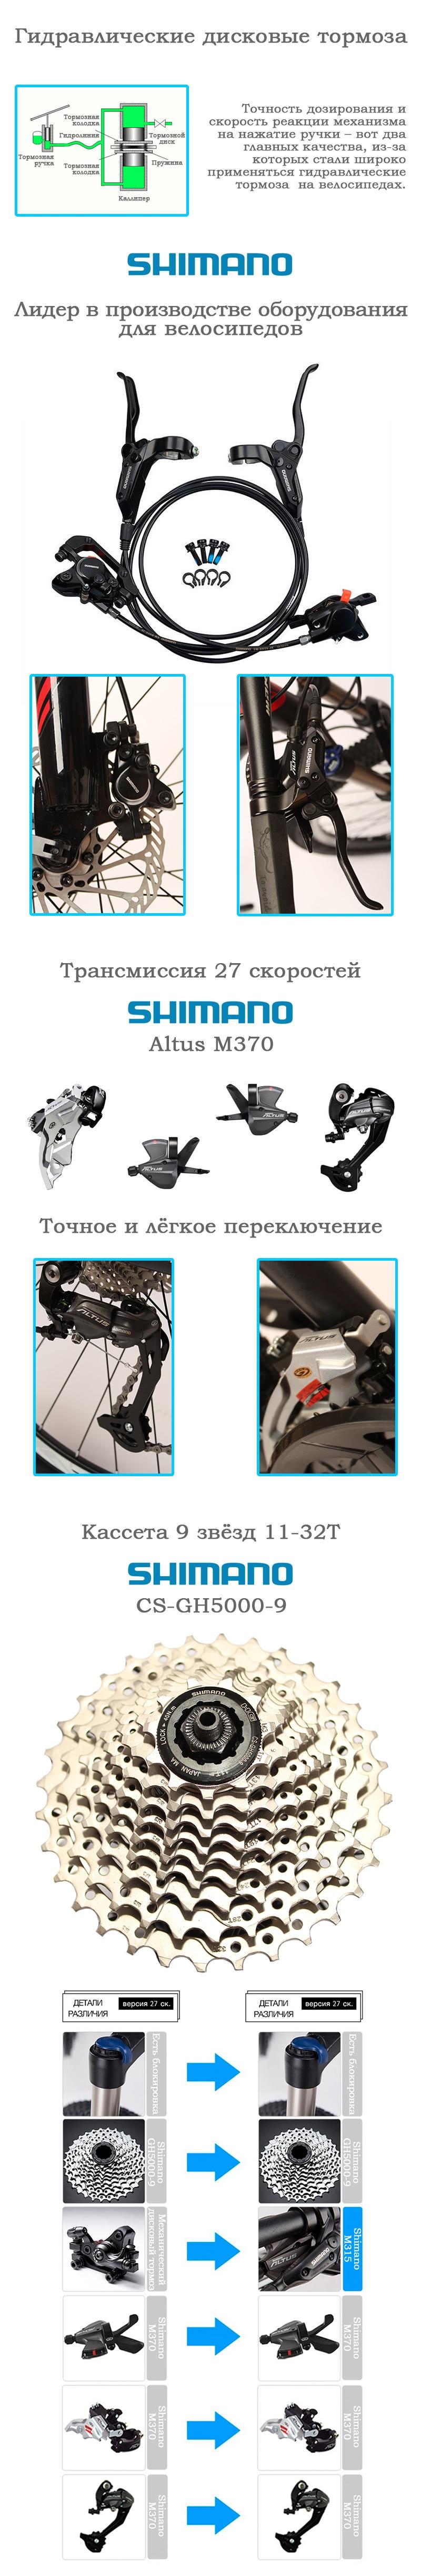 "HTB14SWNbUCF3KVjSZJnq6znHFXaY MAKE Mountain Bike Aluminum Frame SHIMAN0 AItus 27 Speed 26"" 27,5""29  Wheel Hydraulic/Mechanical Brake"